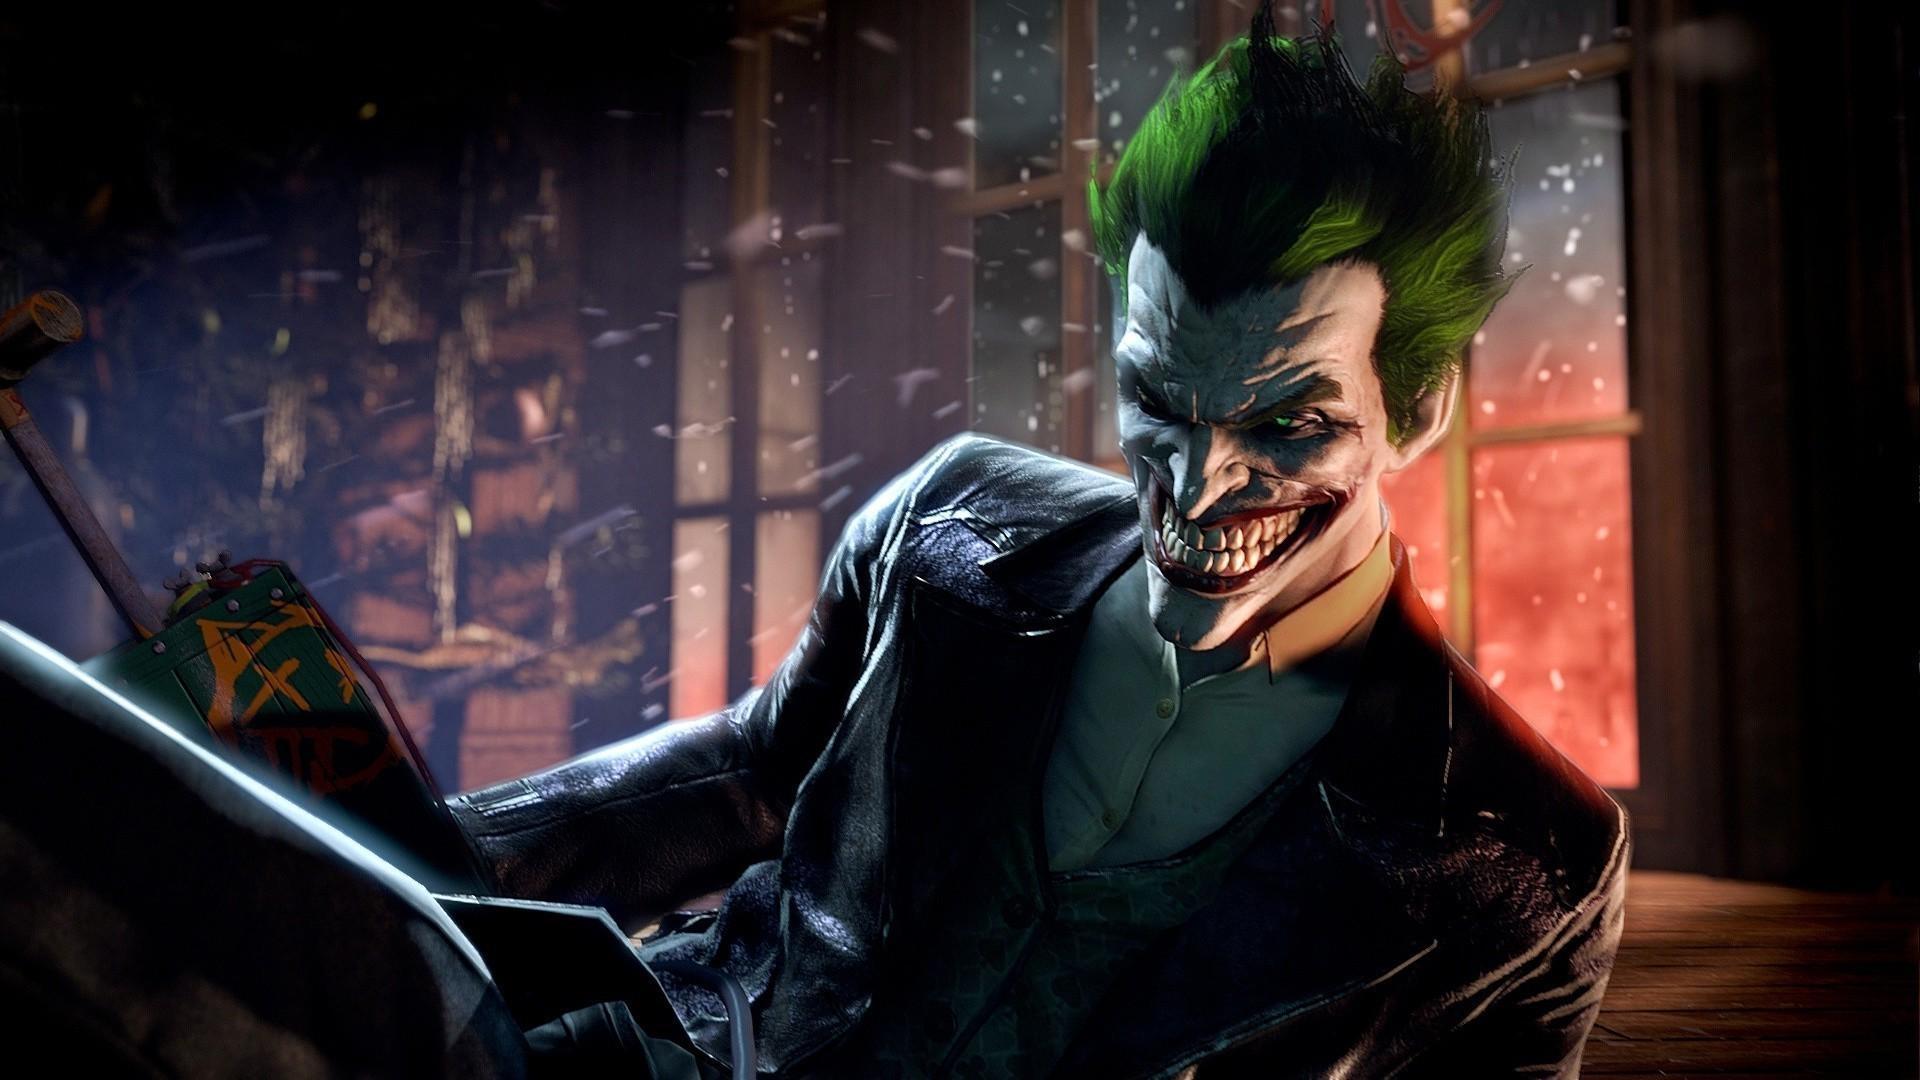 Joker Arkham Origins Hd Wallpaper